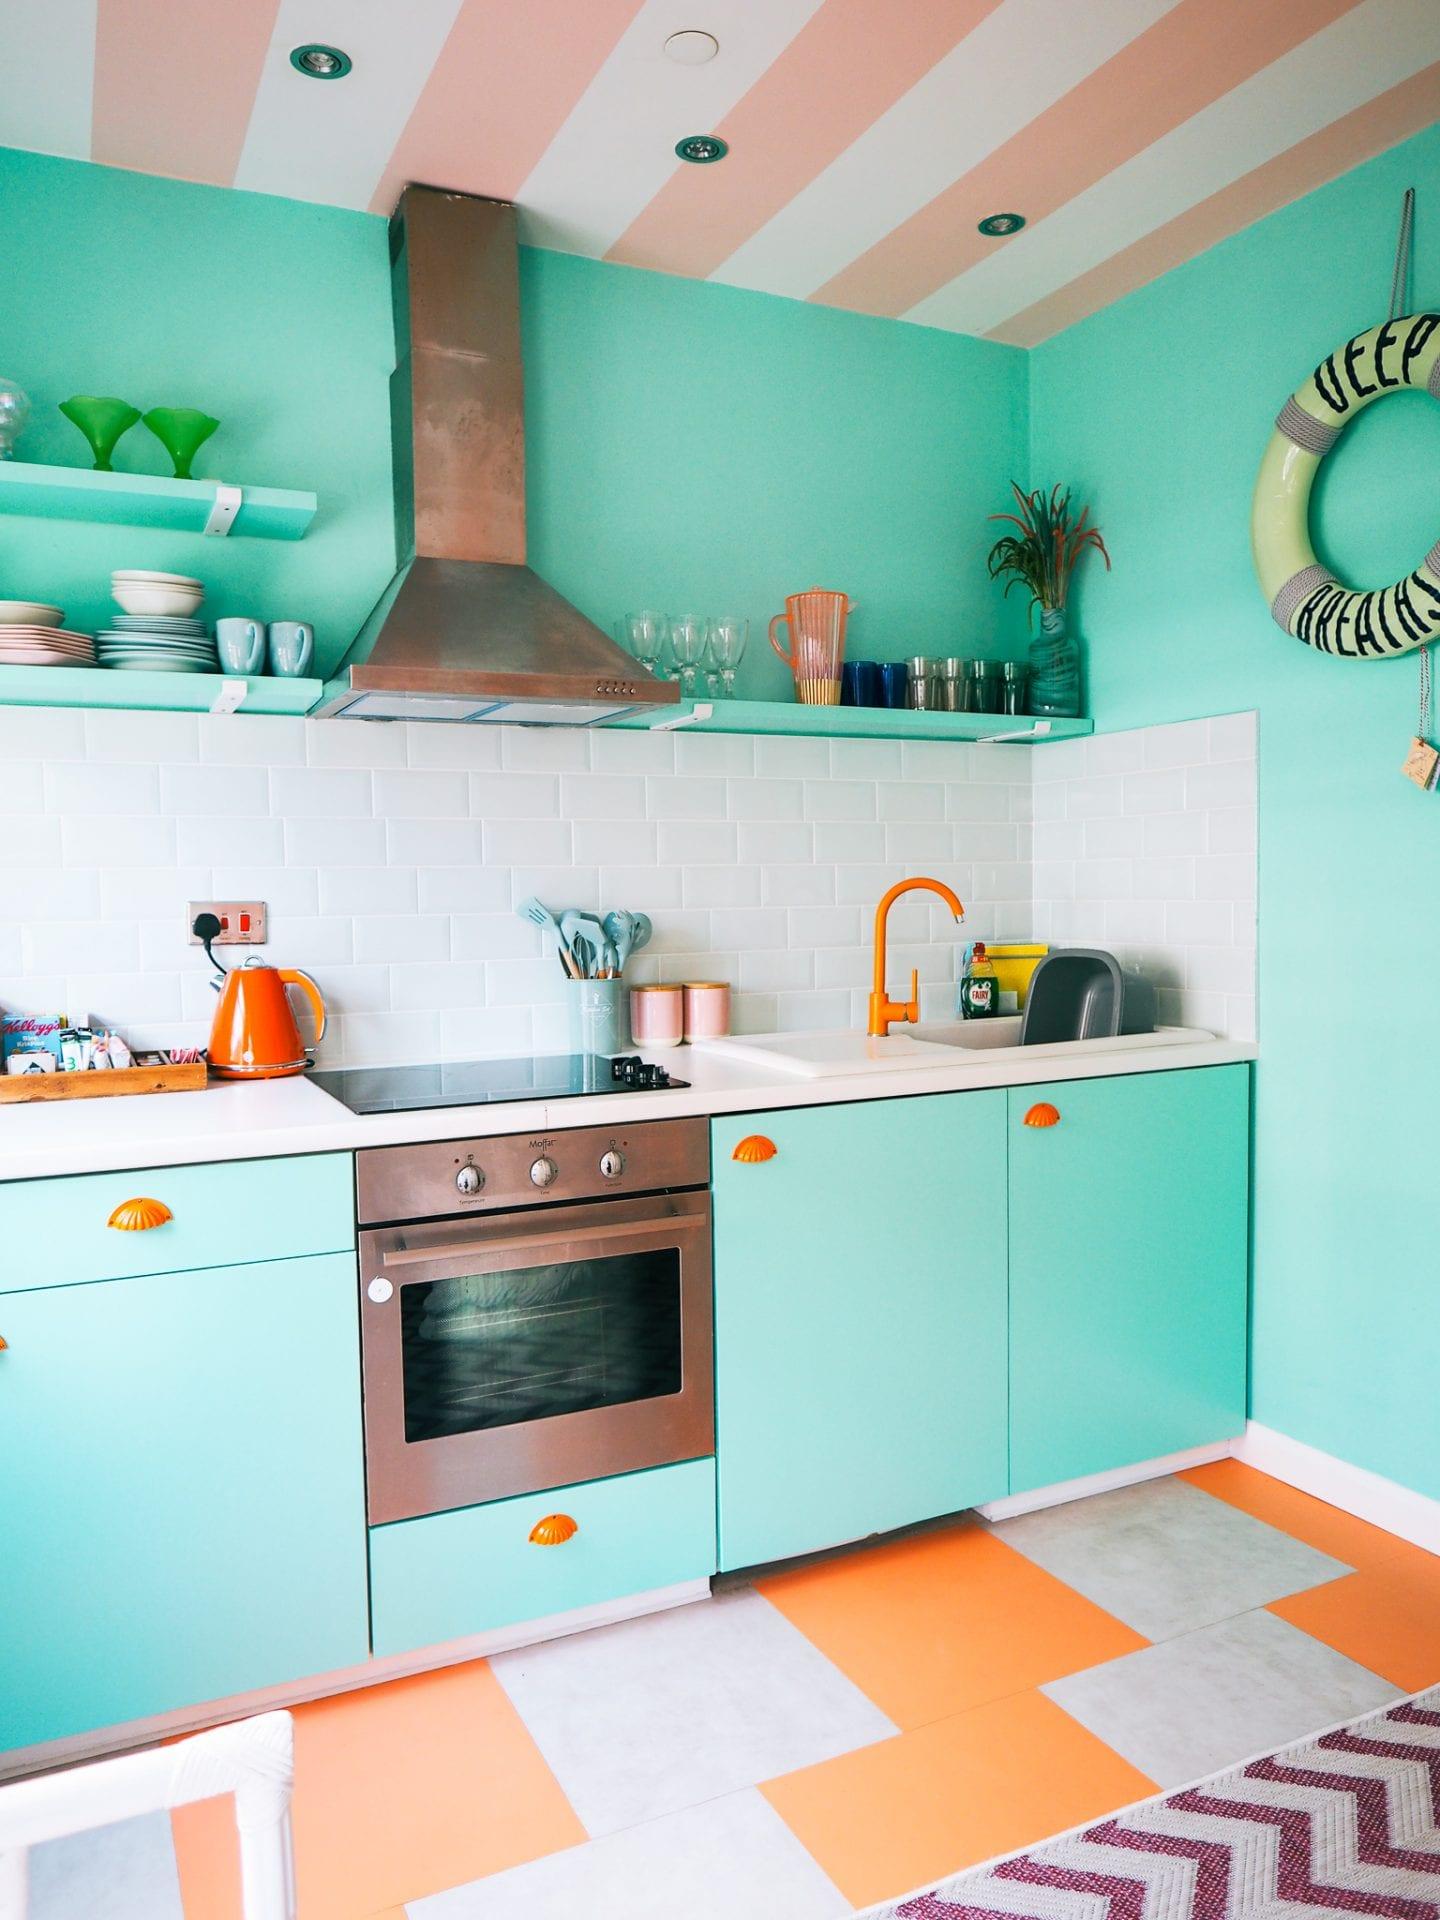 Margate-suites-hotel-airbnb-holiday-cottage-aqua-kitchen-orange